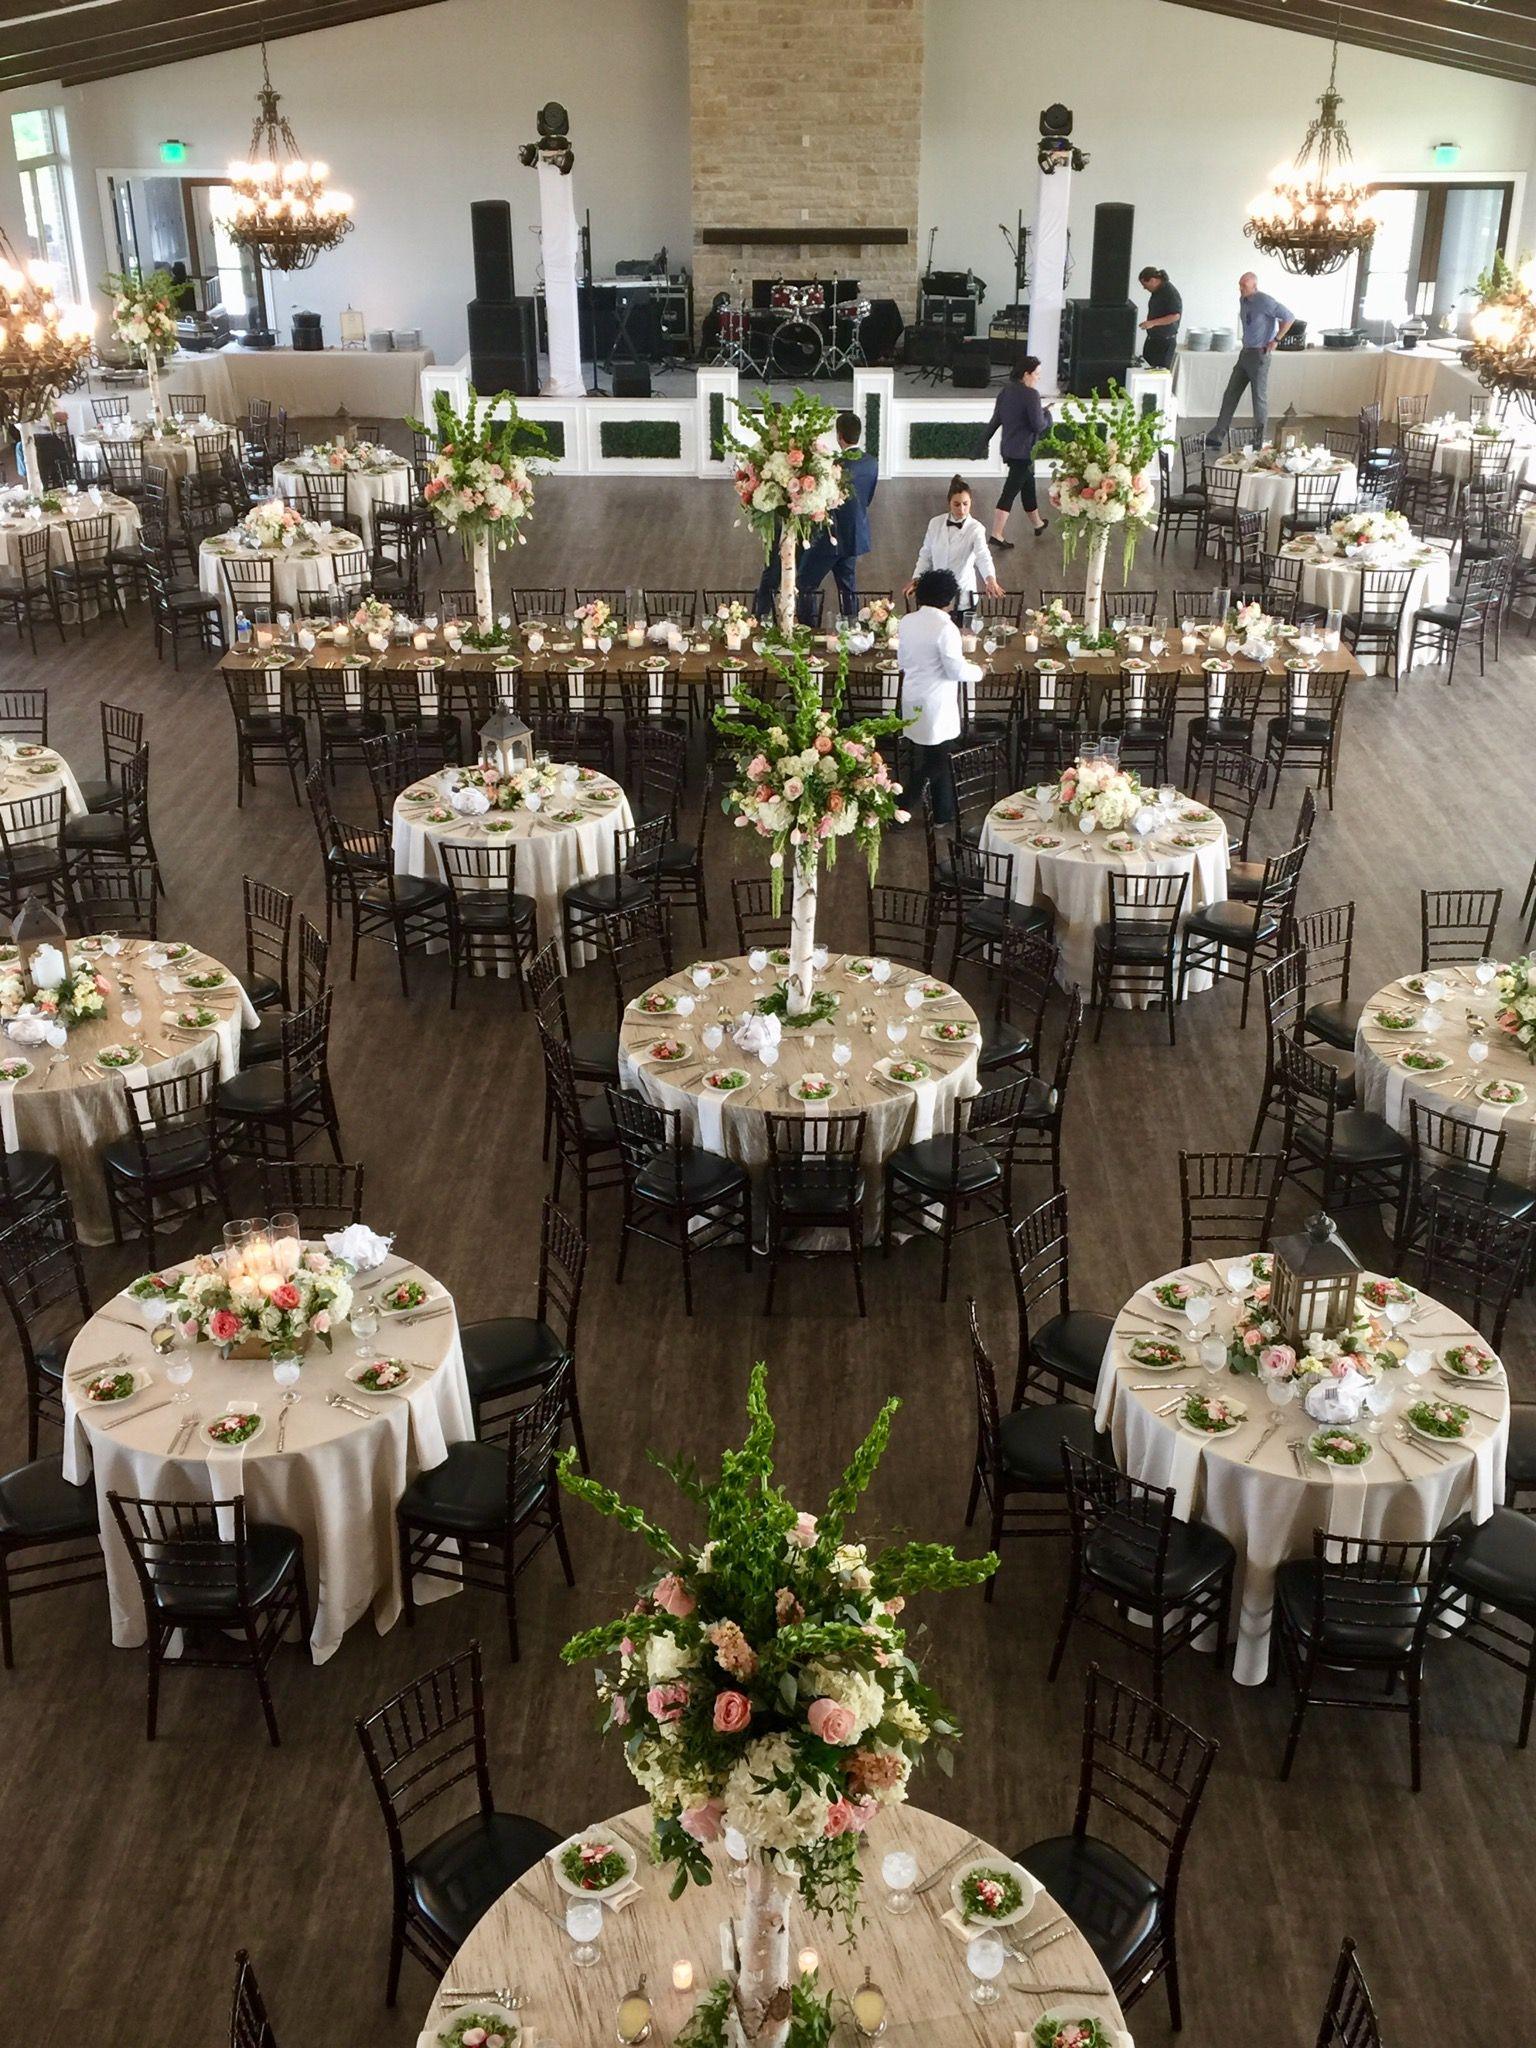 Elegant Venue Overlooking Texas Hills Dove Ridge Vineyard Just Outside Fort Worth In Weath Wedding Reception Layout Large Wedding Venues Elegant Wedding Venues